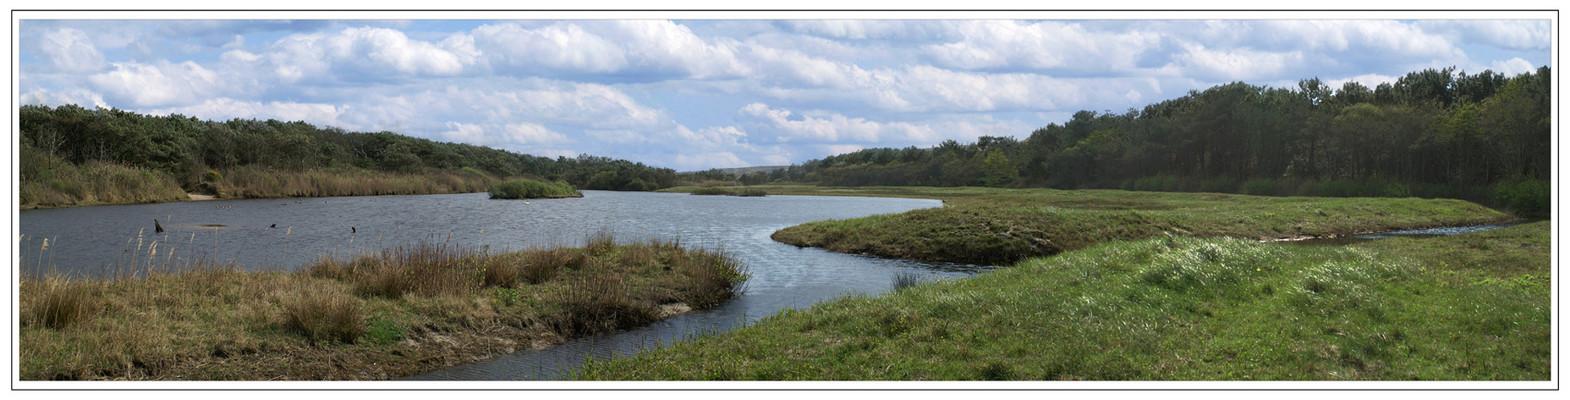 L'étang de la Mallouèyre